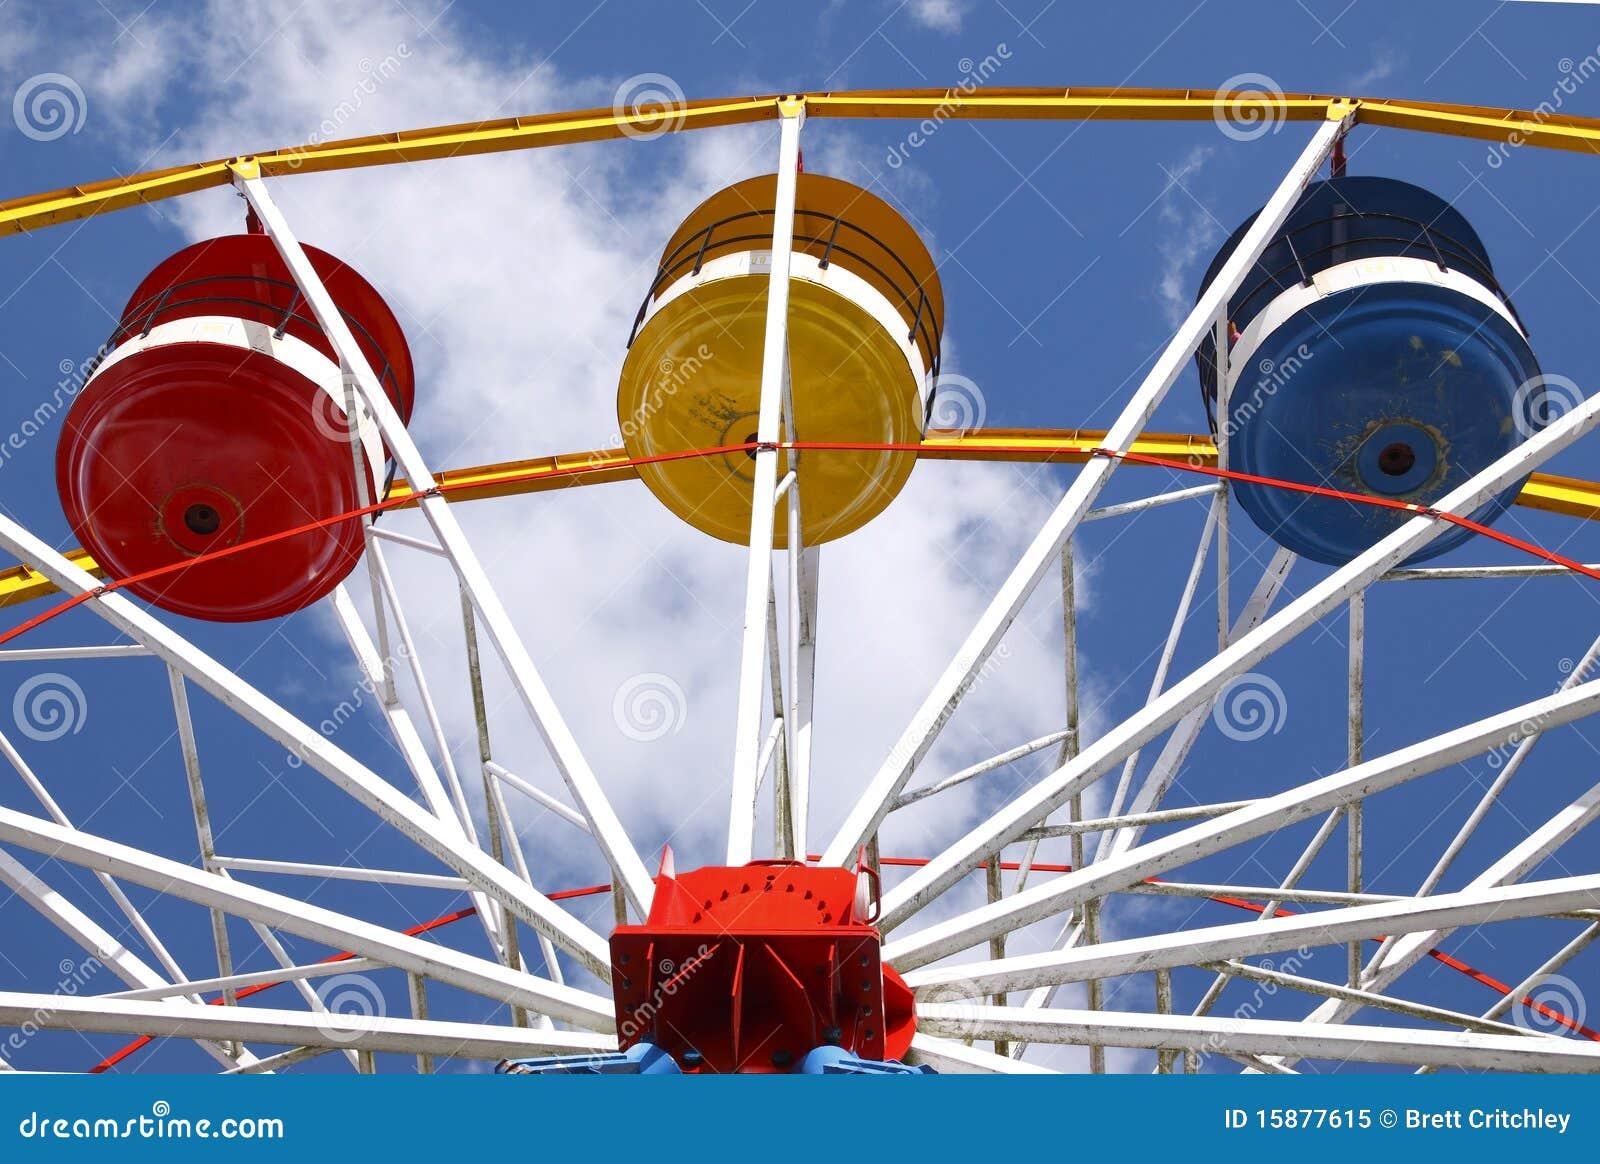 Roda do Funfair